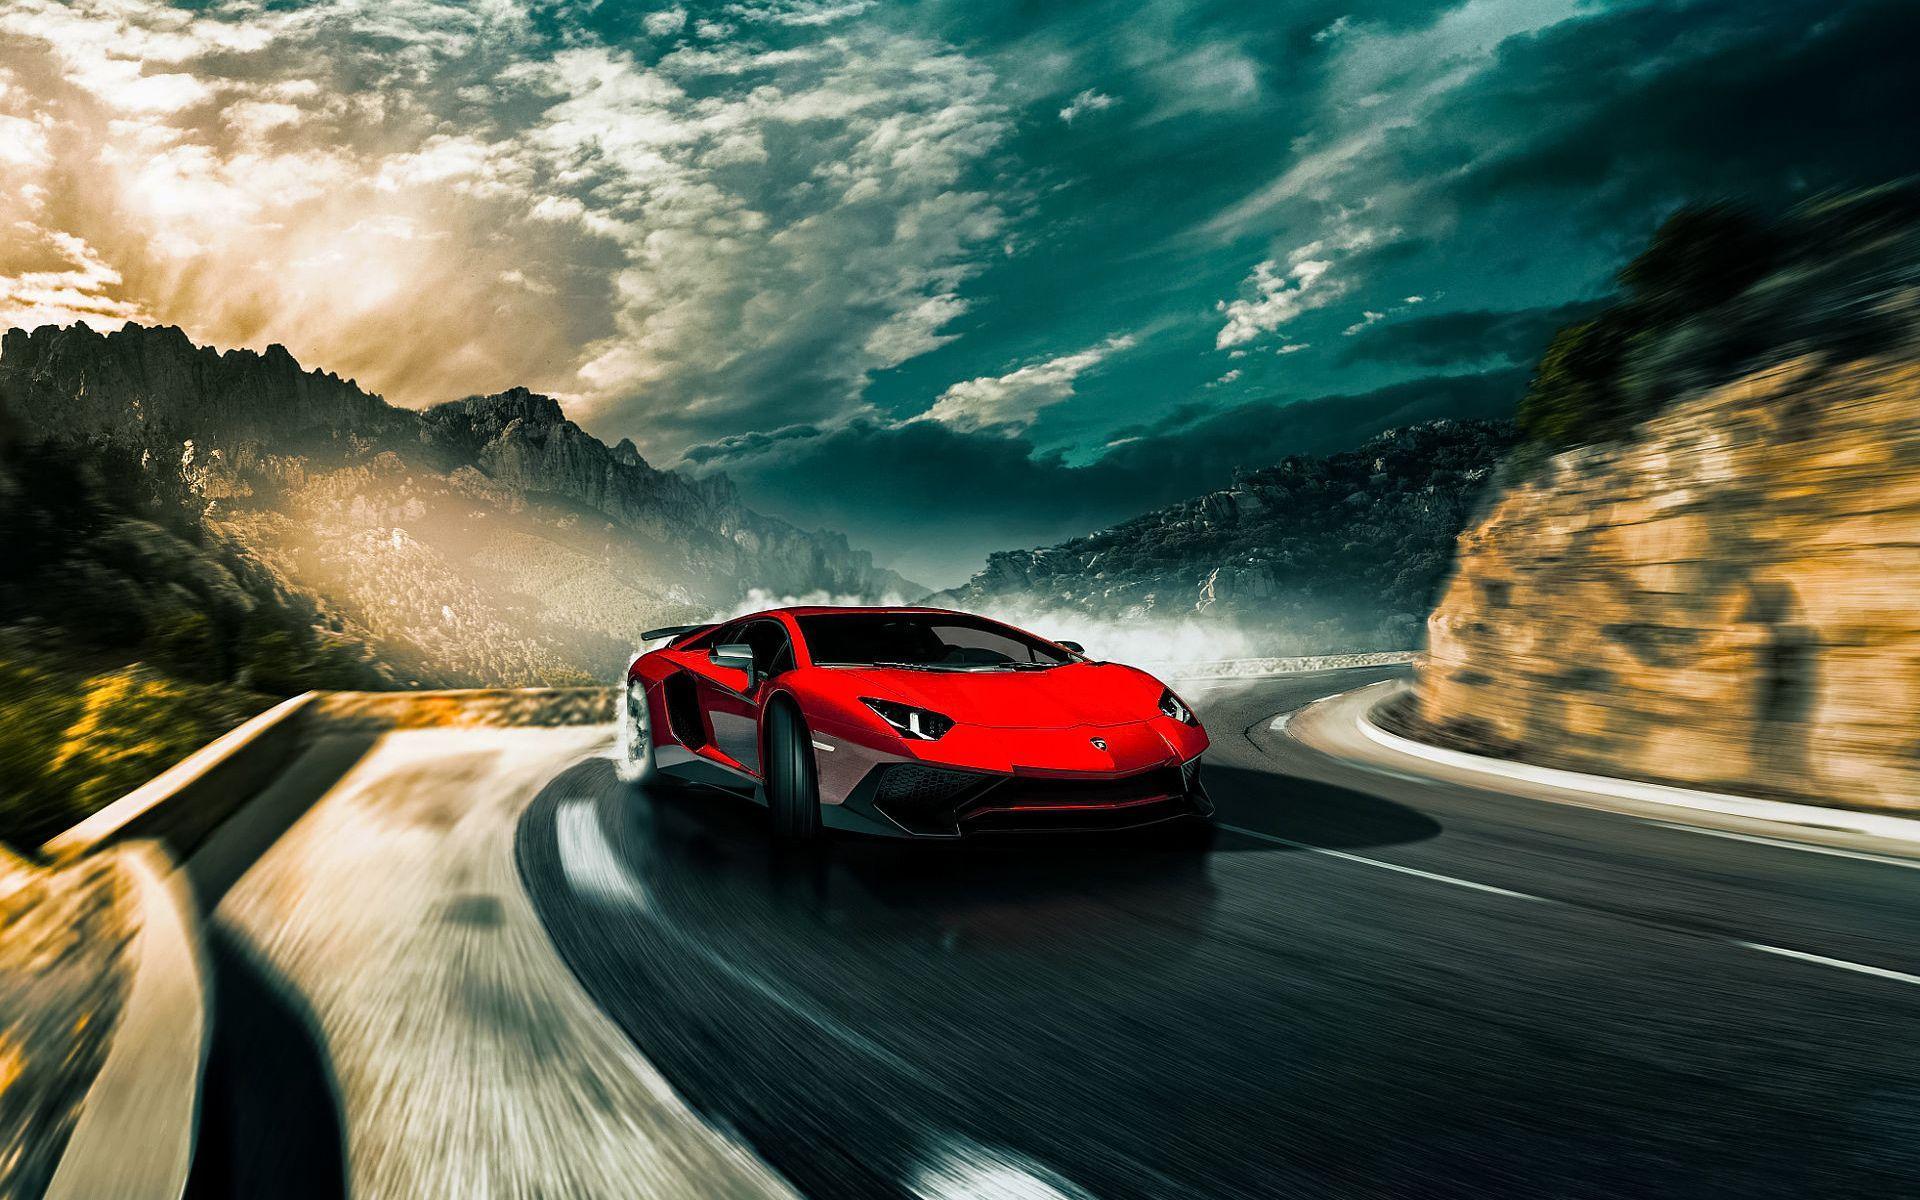 Lamborghini Aventador Wallpapers Top Free Lamborghini